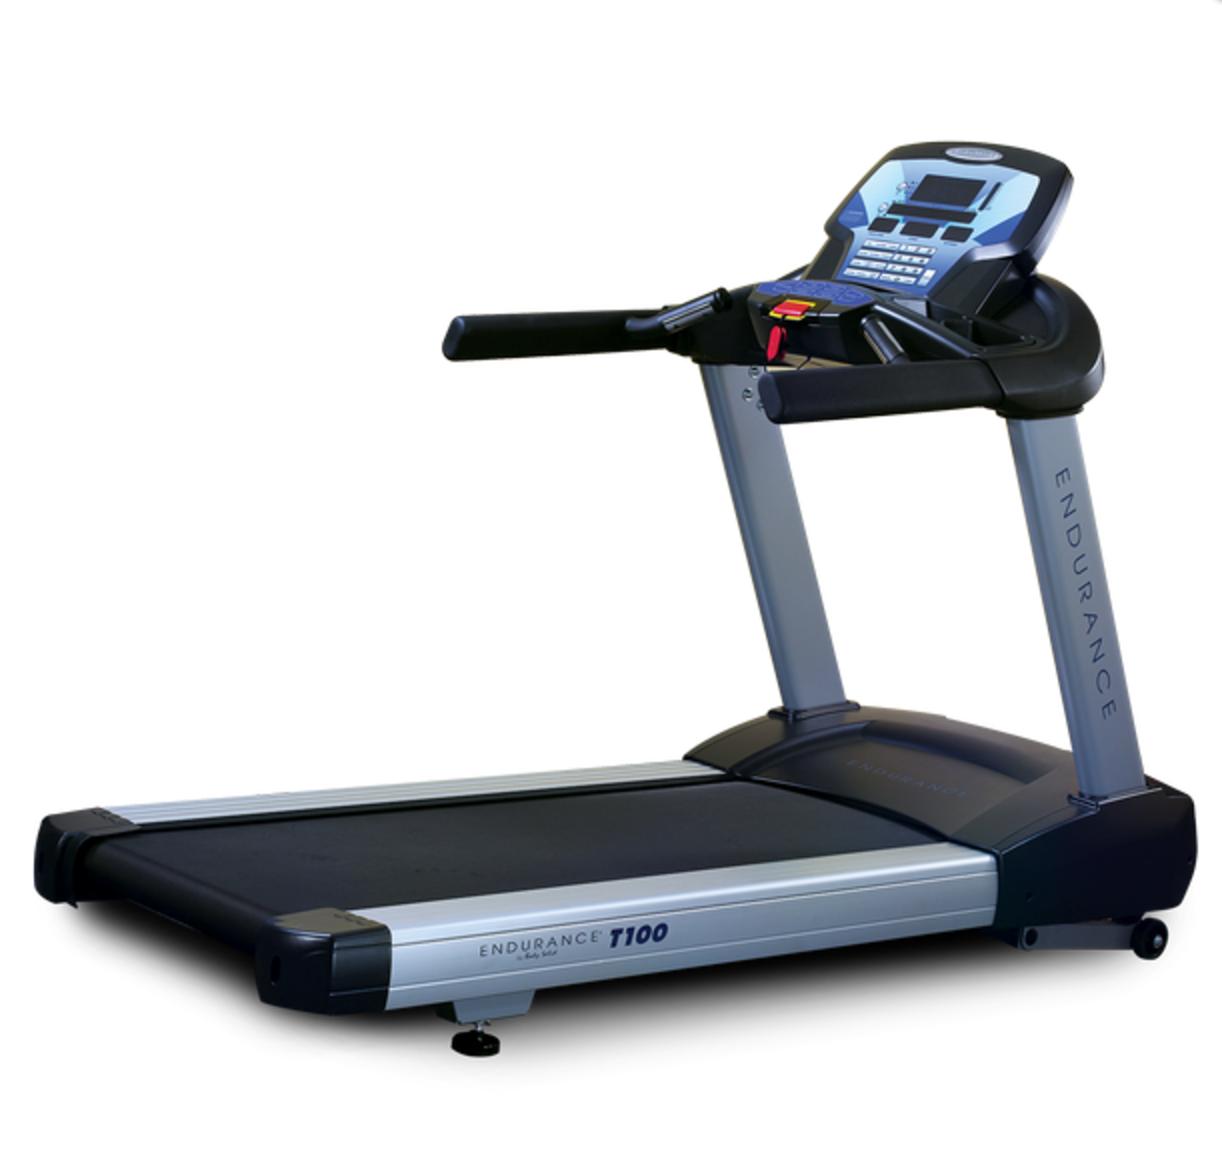 Body-Solid T100 Endurance Treadmill - New